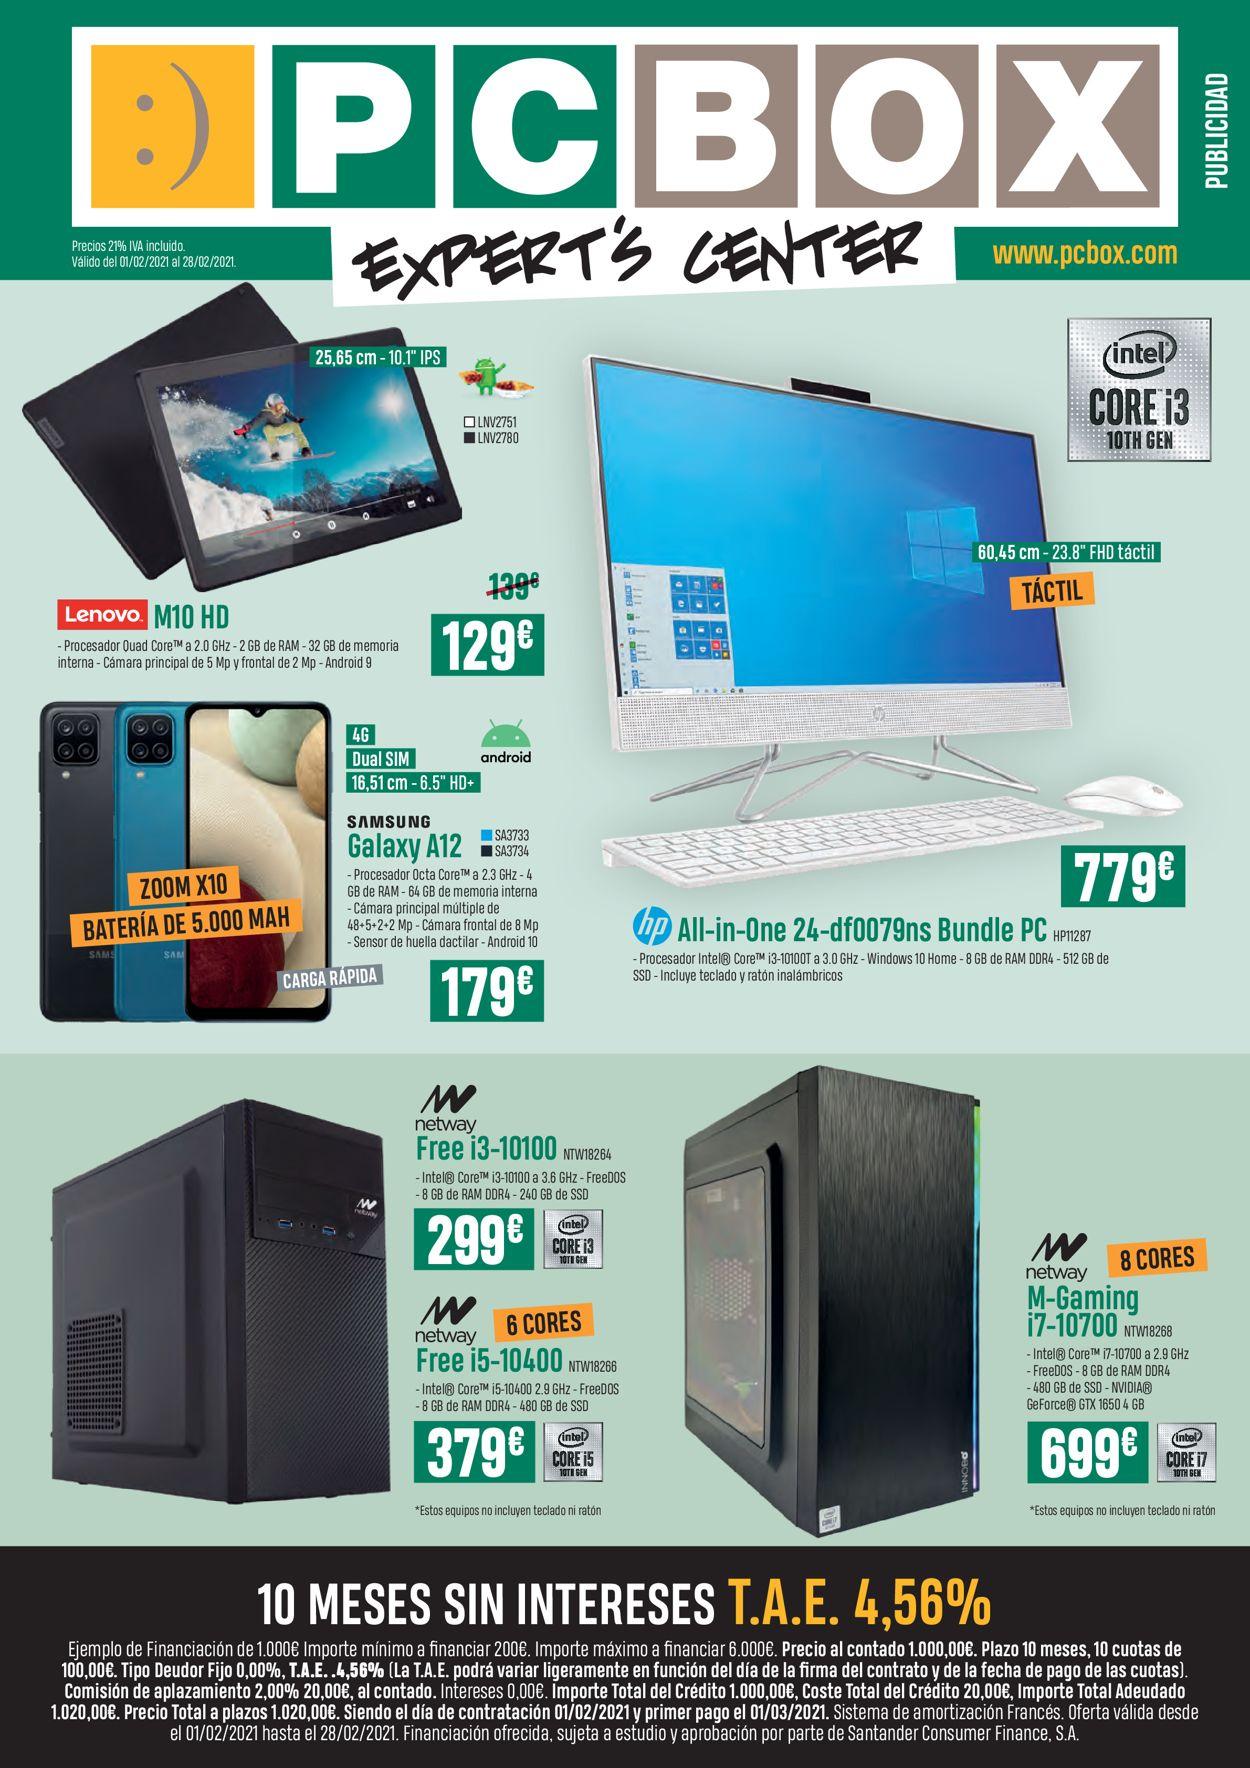 PC Box Folleto - 01.02-28.02.2021